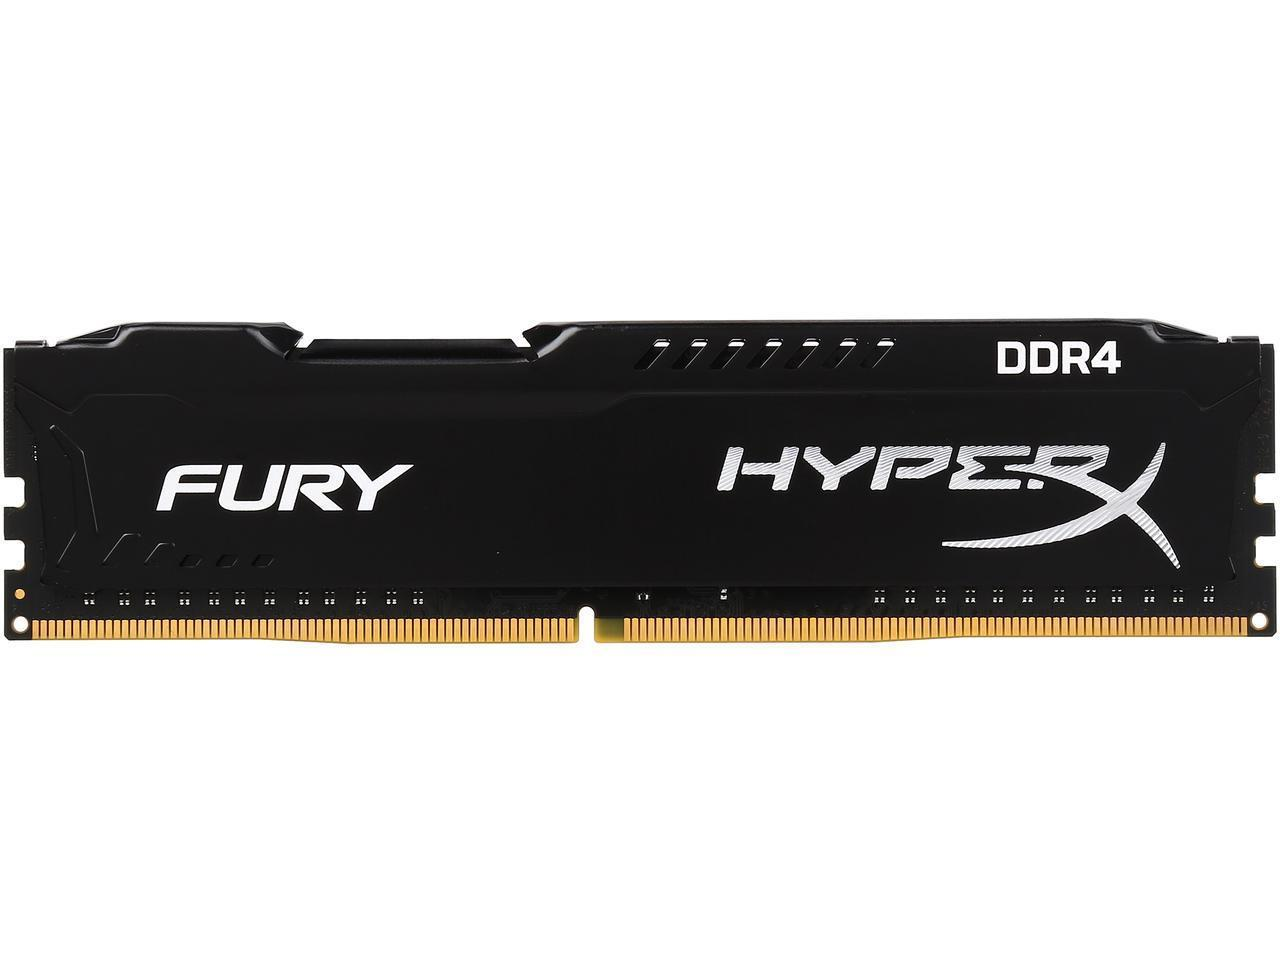 Памет Kingston HyperX Fury 4GB DDR4 PC4-19200 2400Mhz CL15 HX424C15FB/4